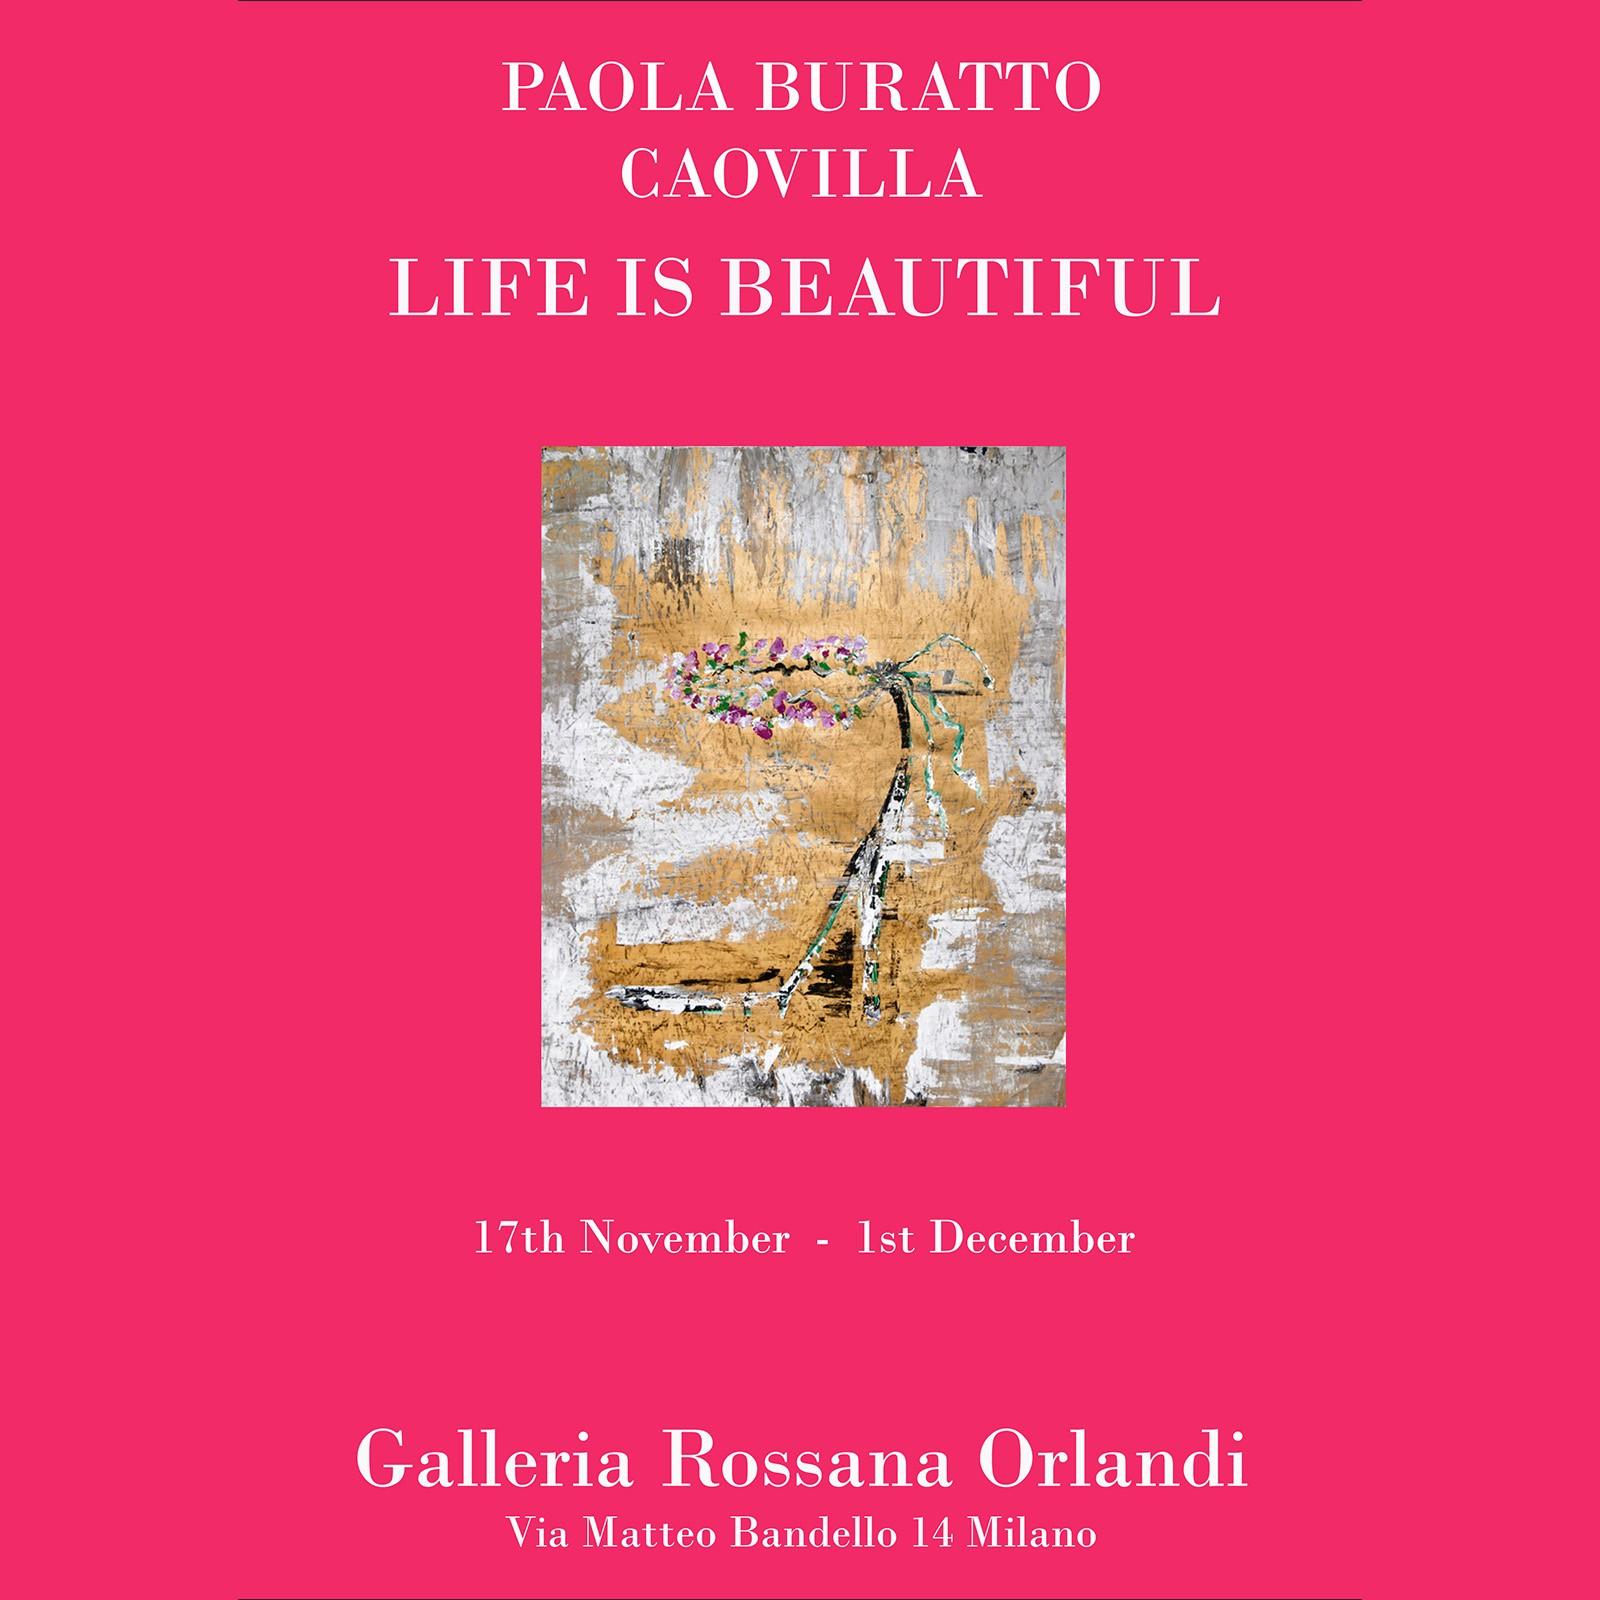 Paola Buratto Caovilla - Life Is Beautiful